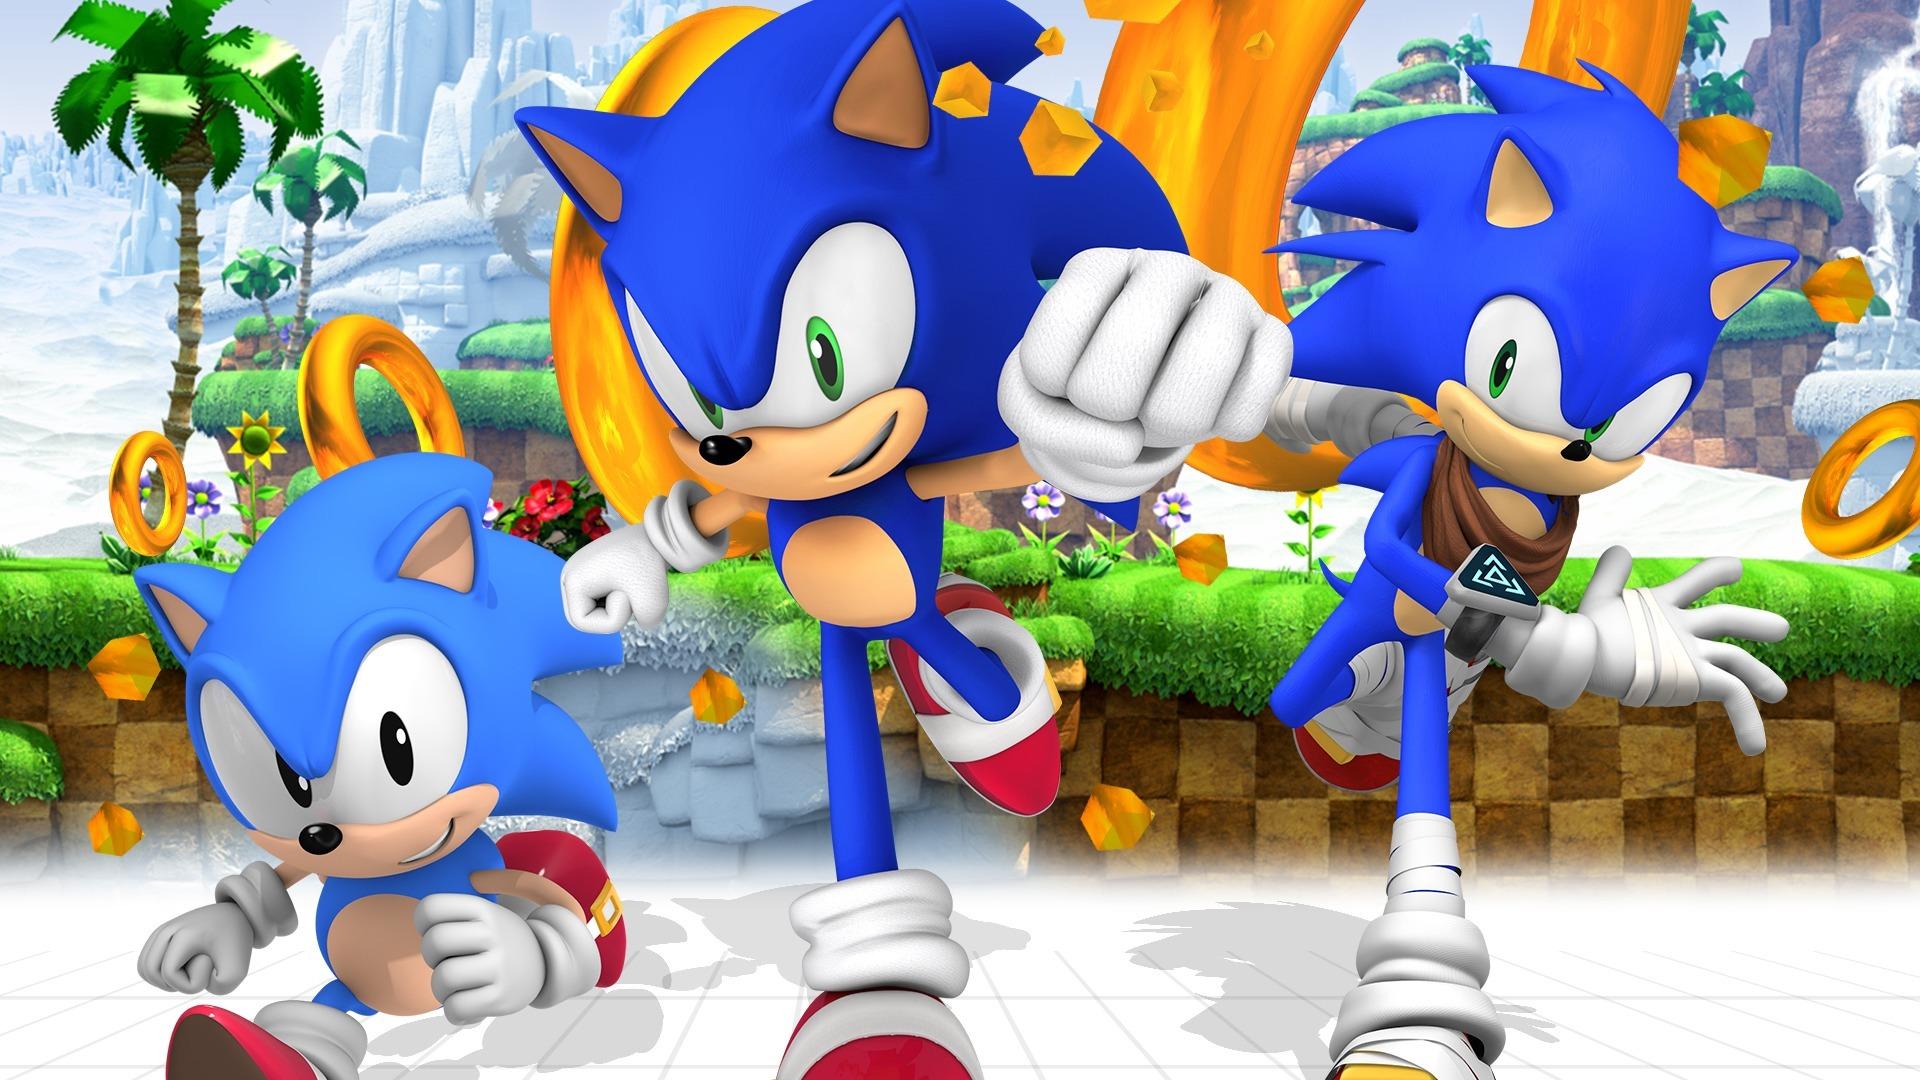 Happy 29th birthday to Sonic the Hedgehog